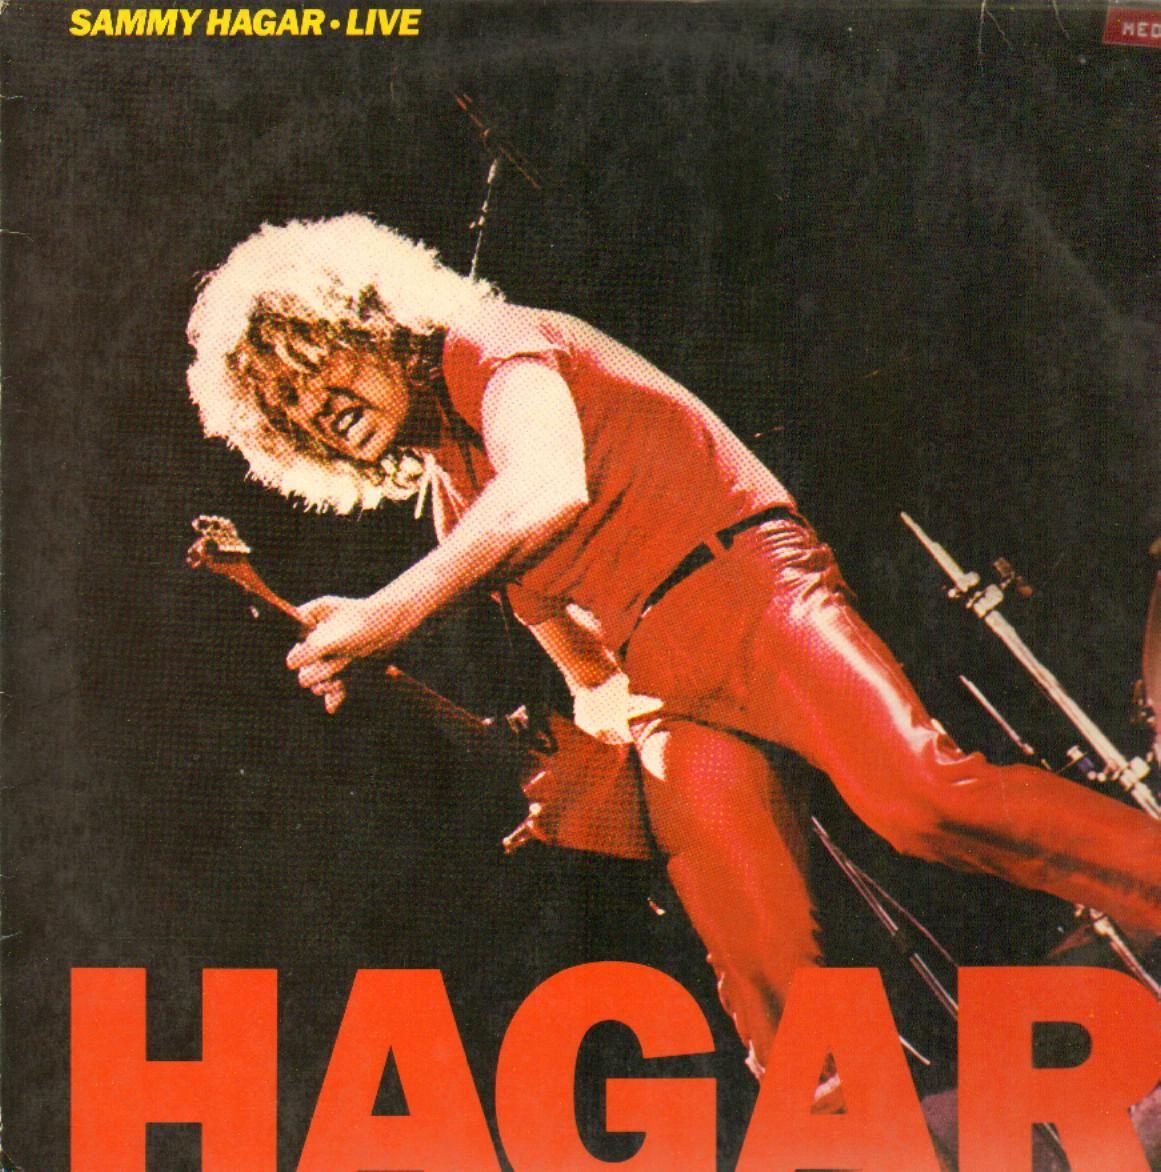 My Music Collection: san manuel casino employee portal Sammy Hagar